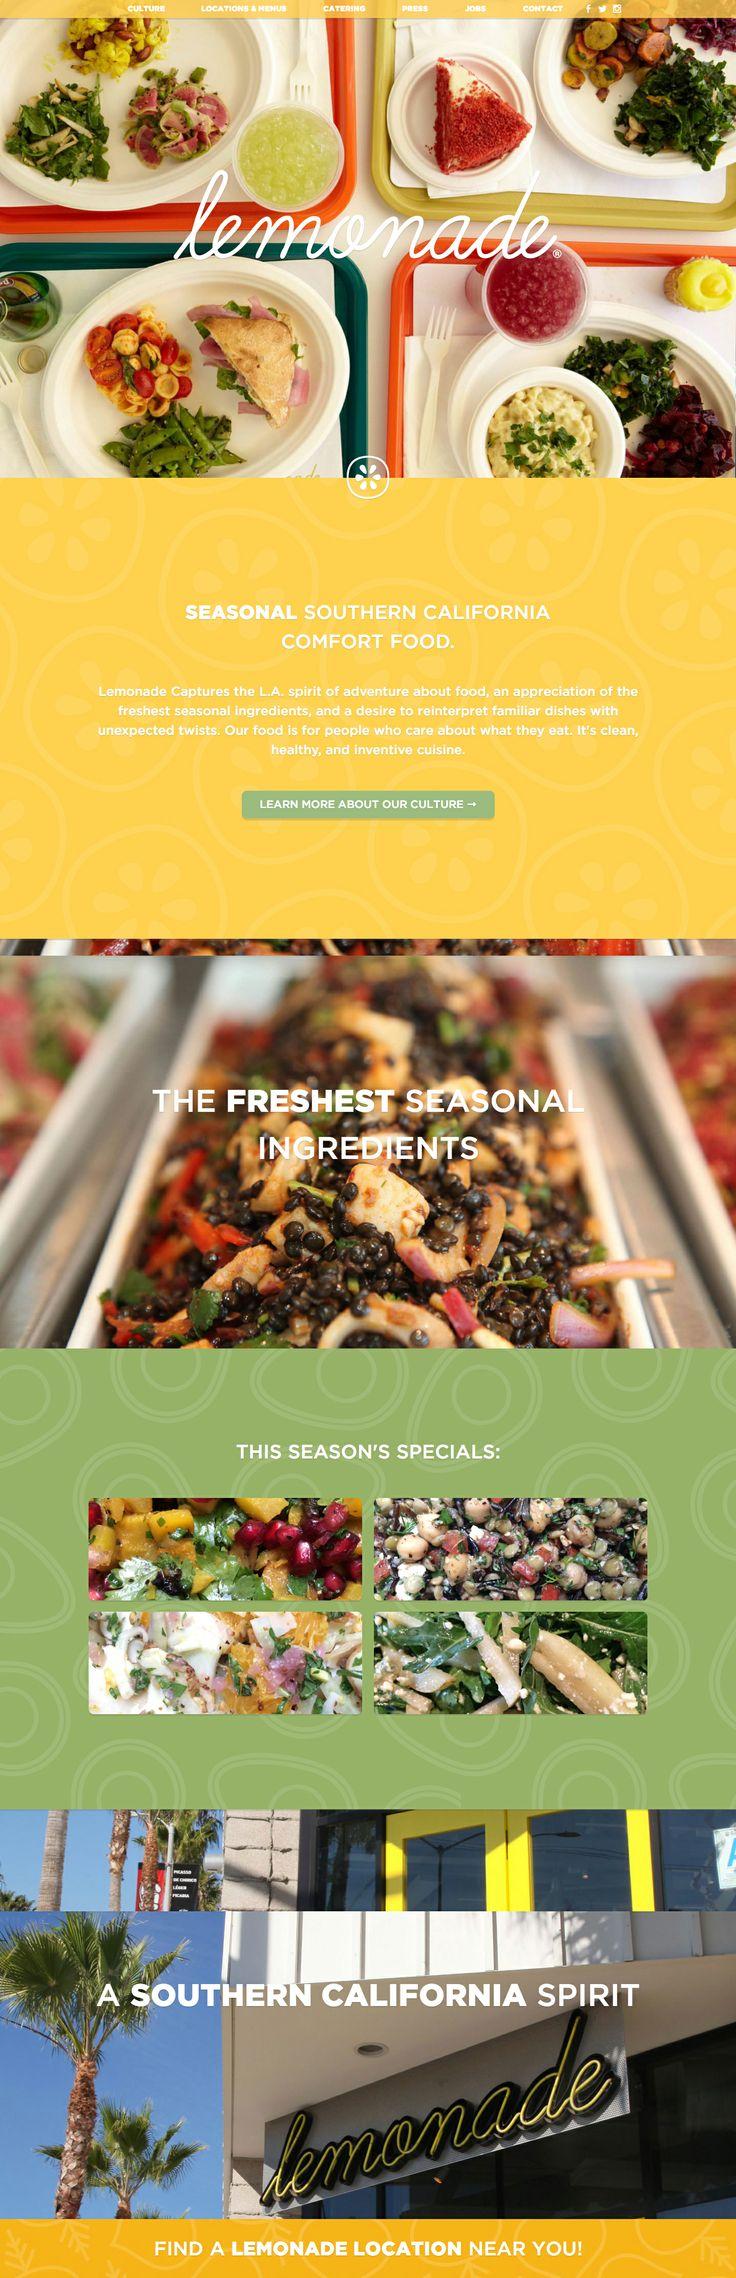 Lemonadela - cheerful colors and vibrant food photography, neat stacking submenus